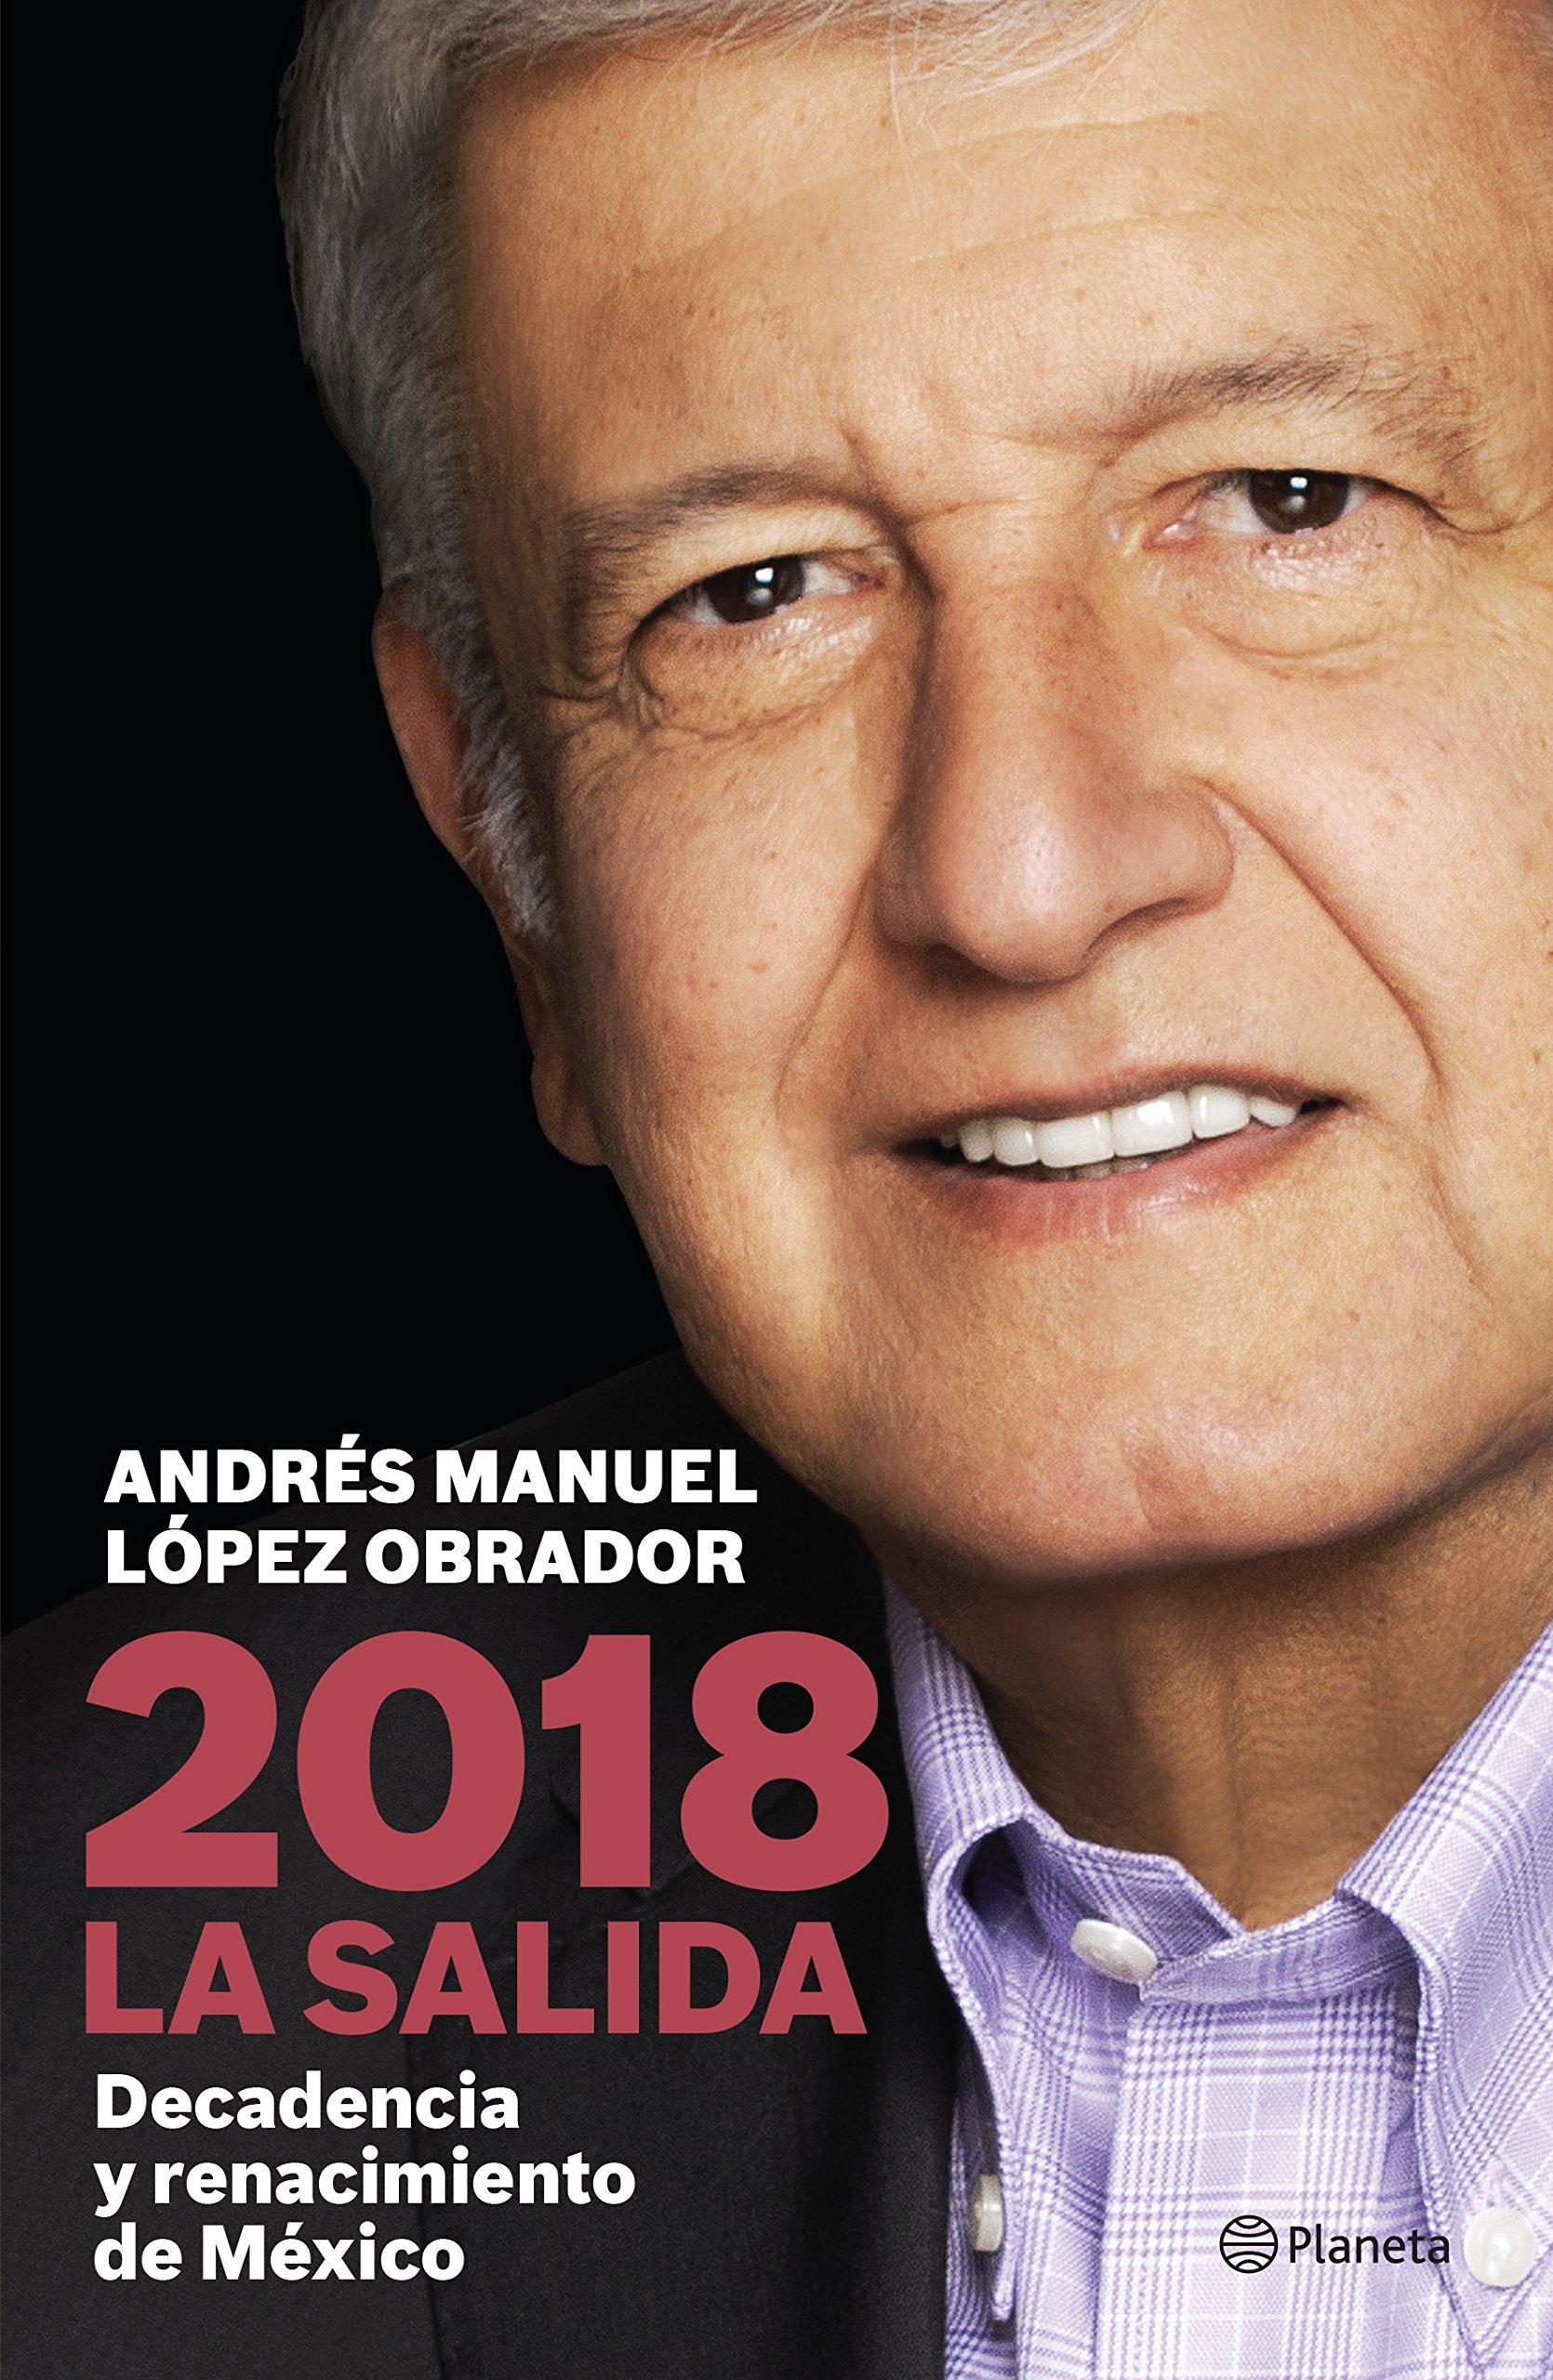 2018 la salida spanish edition l pez 9786070738739 amazon com books